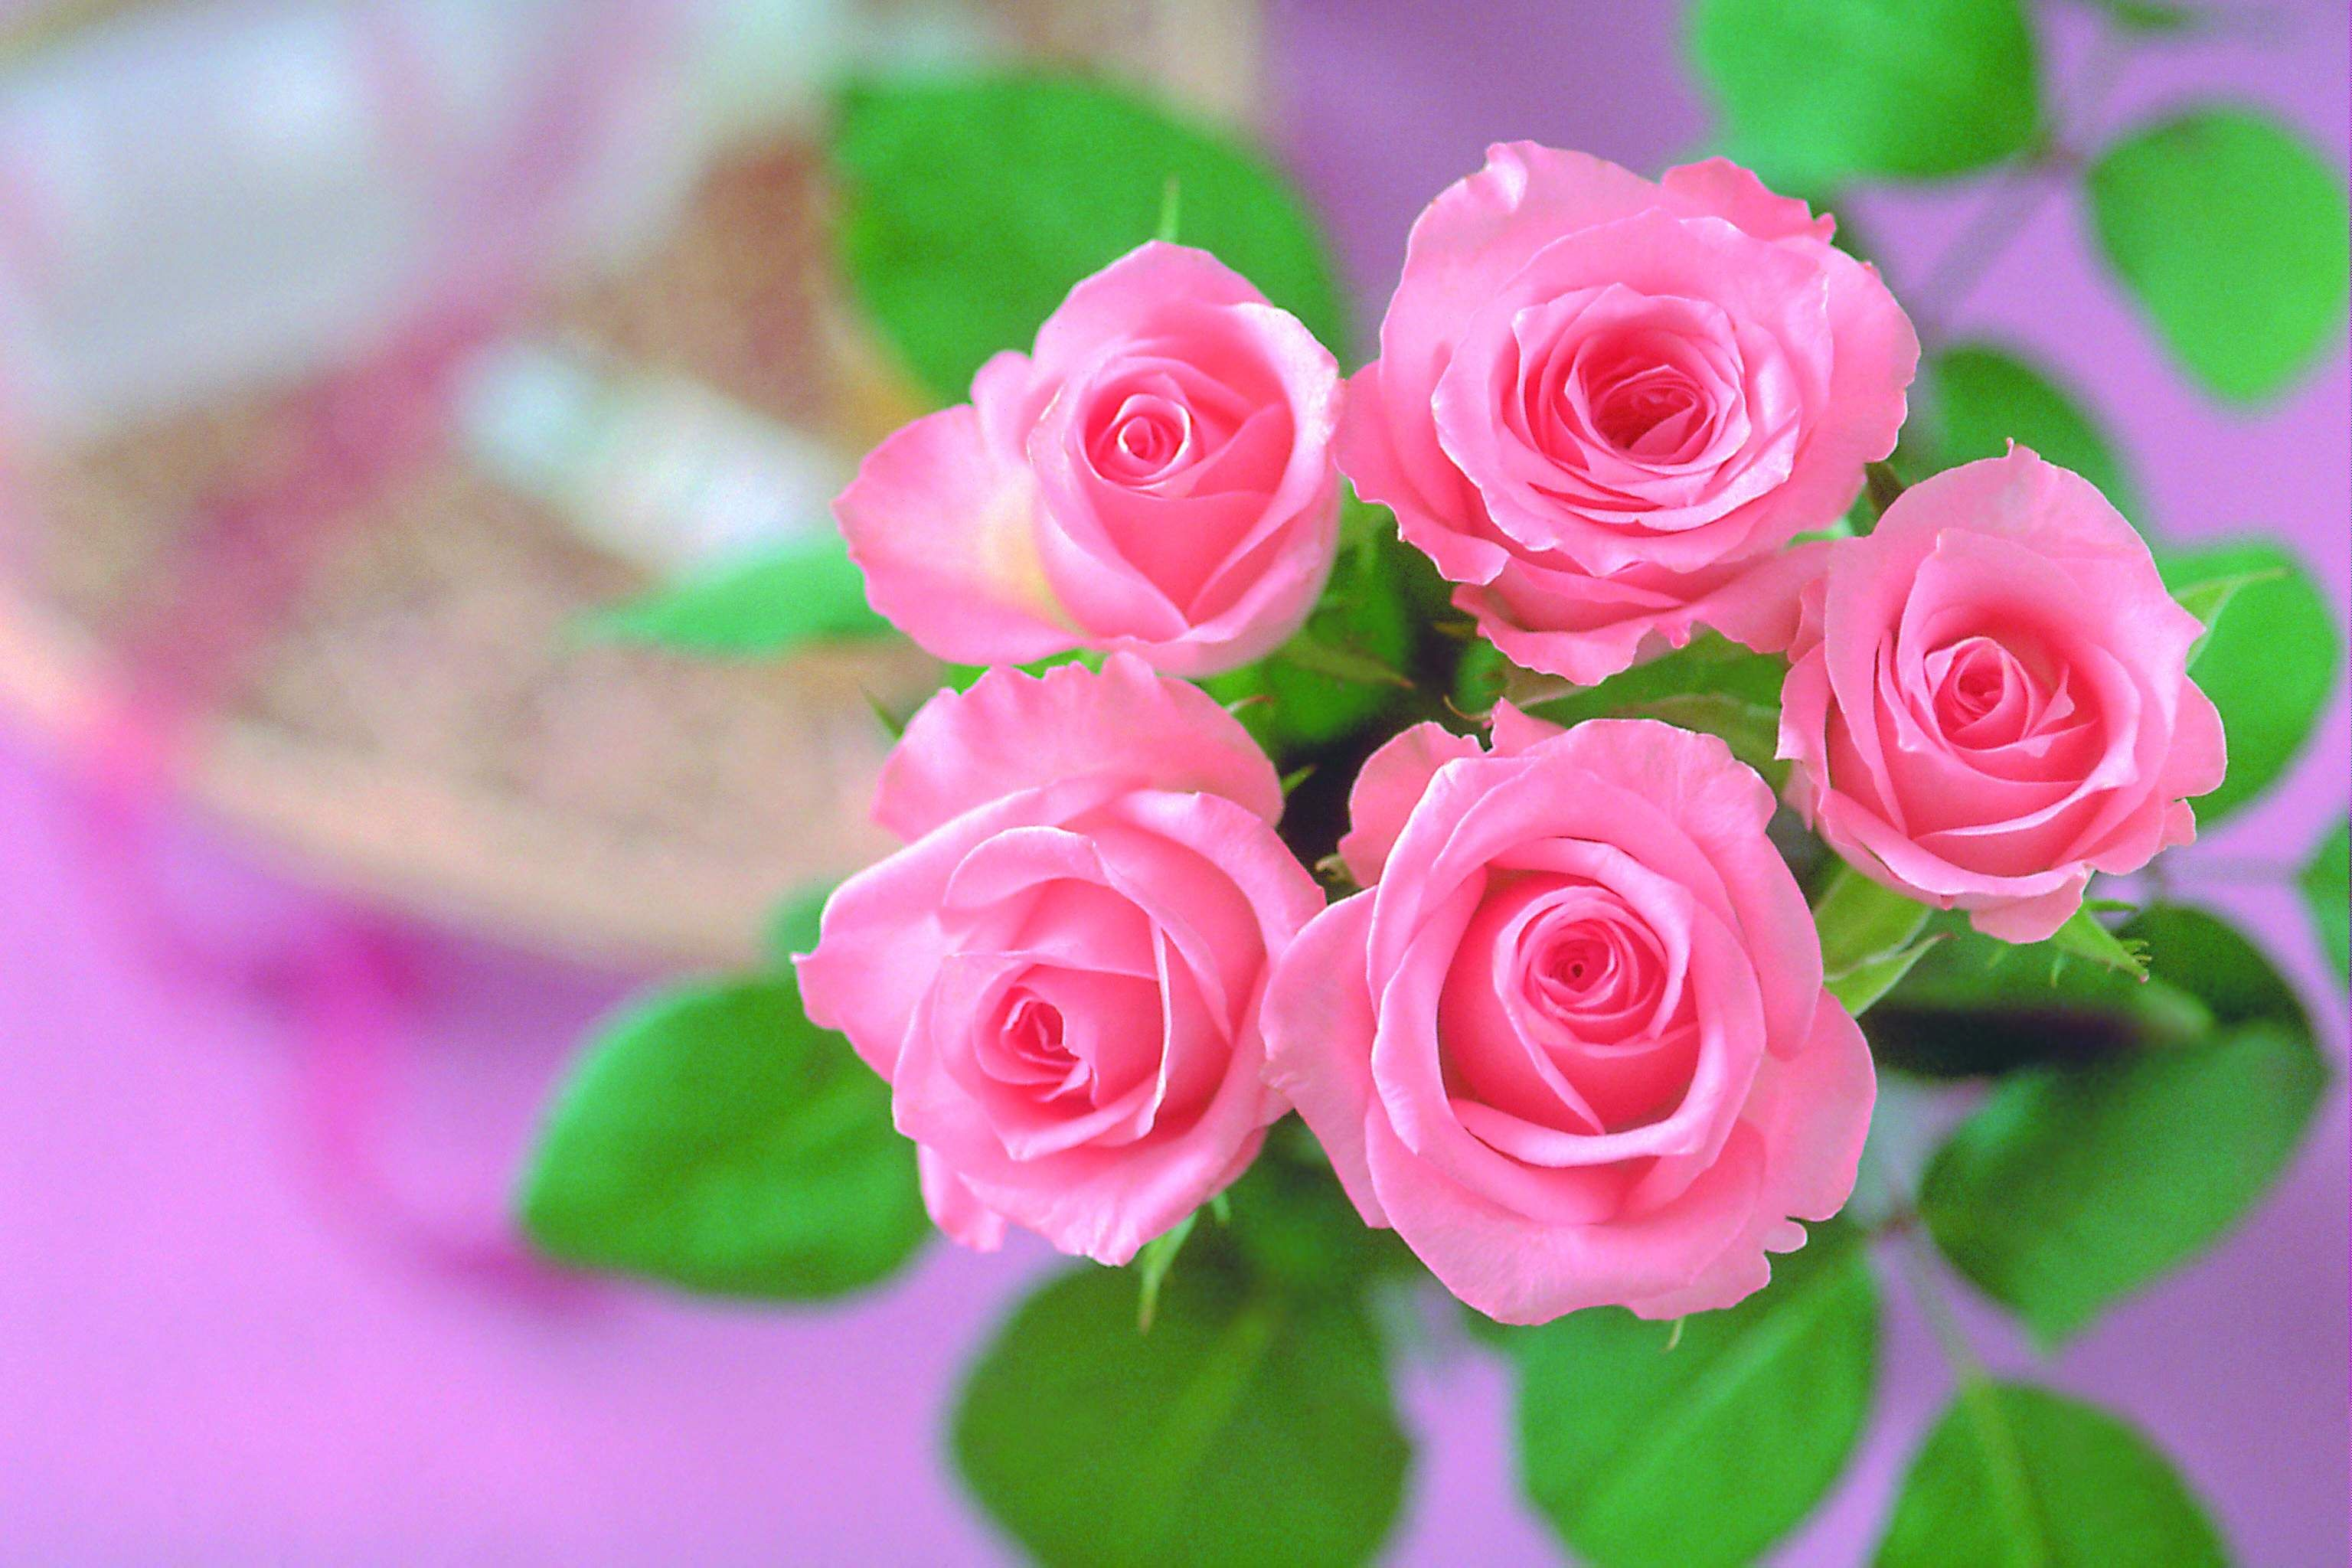 Rose Wallpaper Hd Tumblr For Walls For Mobile Phone Widescreen For Desktop Full Size Dwonload 2013 P Rose Flower Wallpaper Rose Flower Quotes Pink Rose Flower